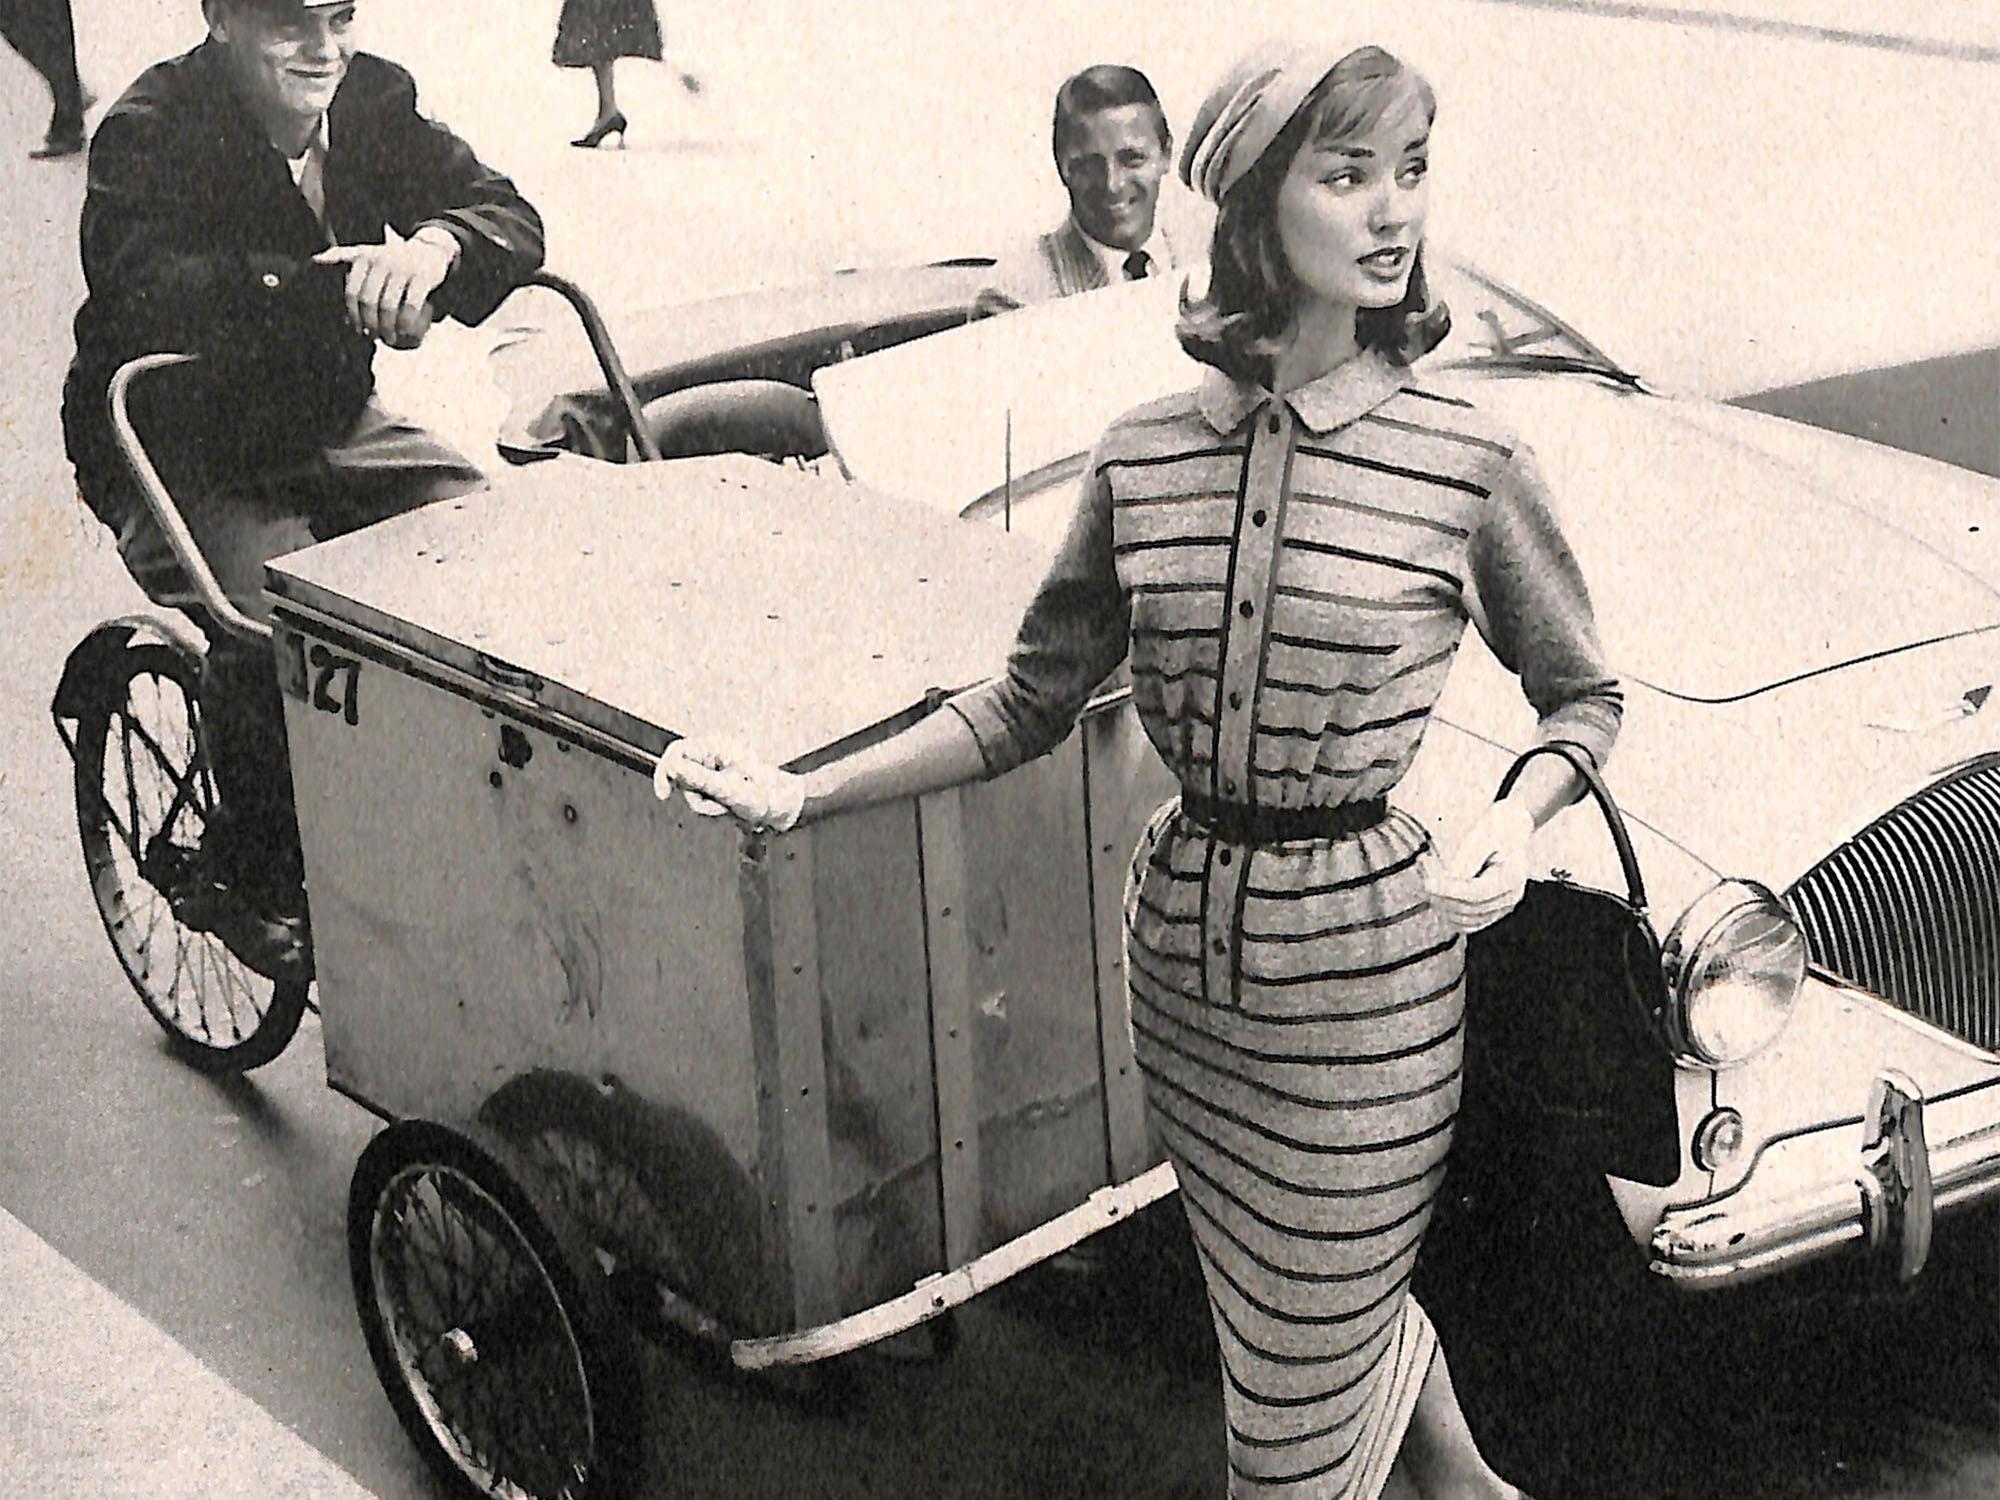 Vintage Fashion Ad - street scene